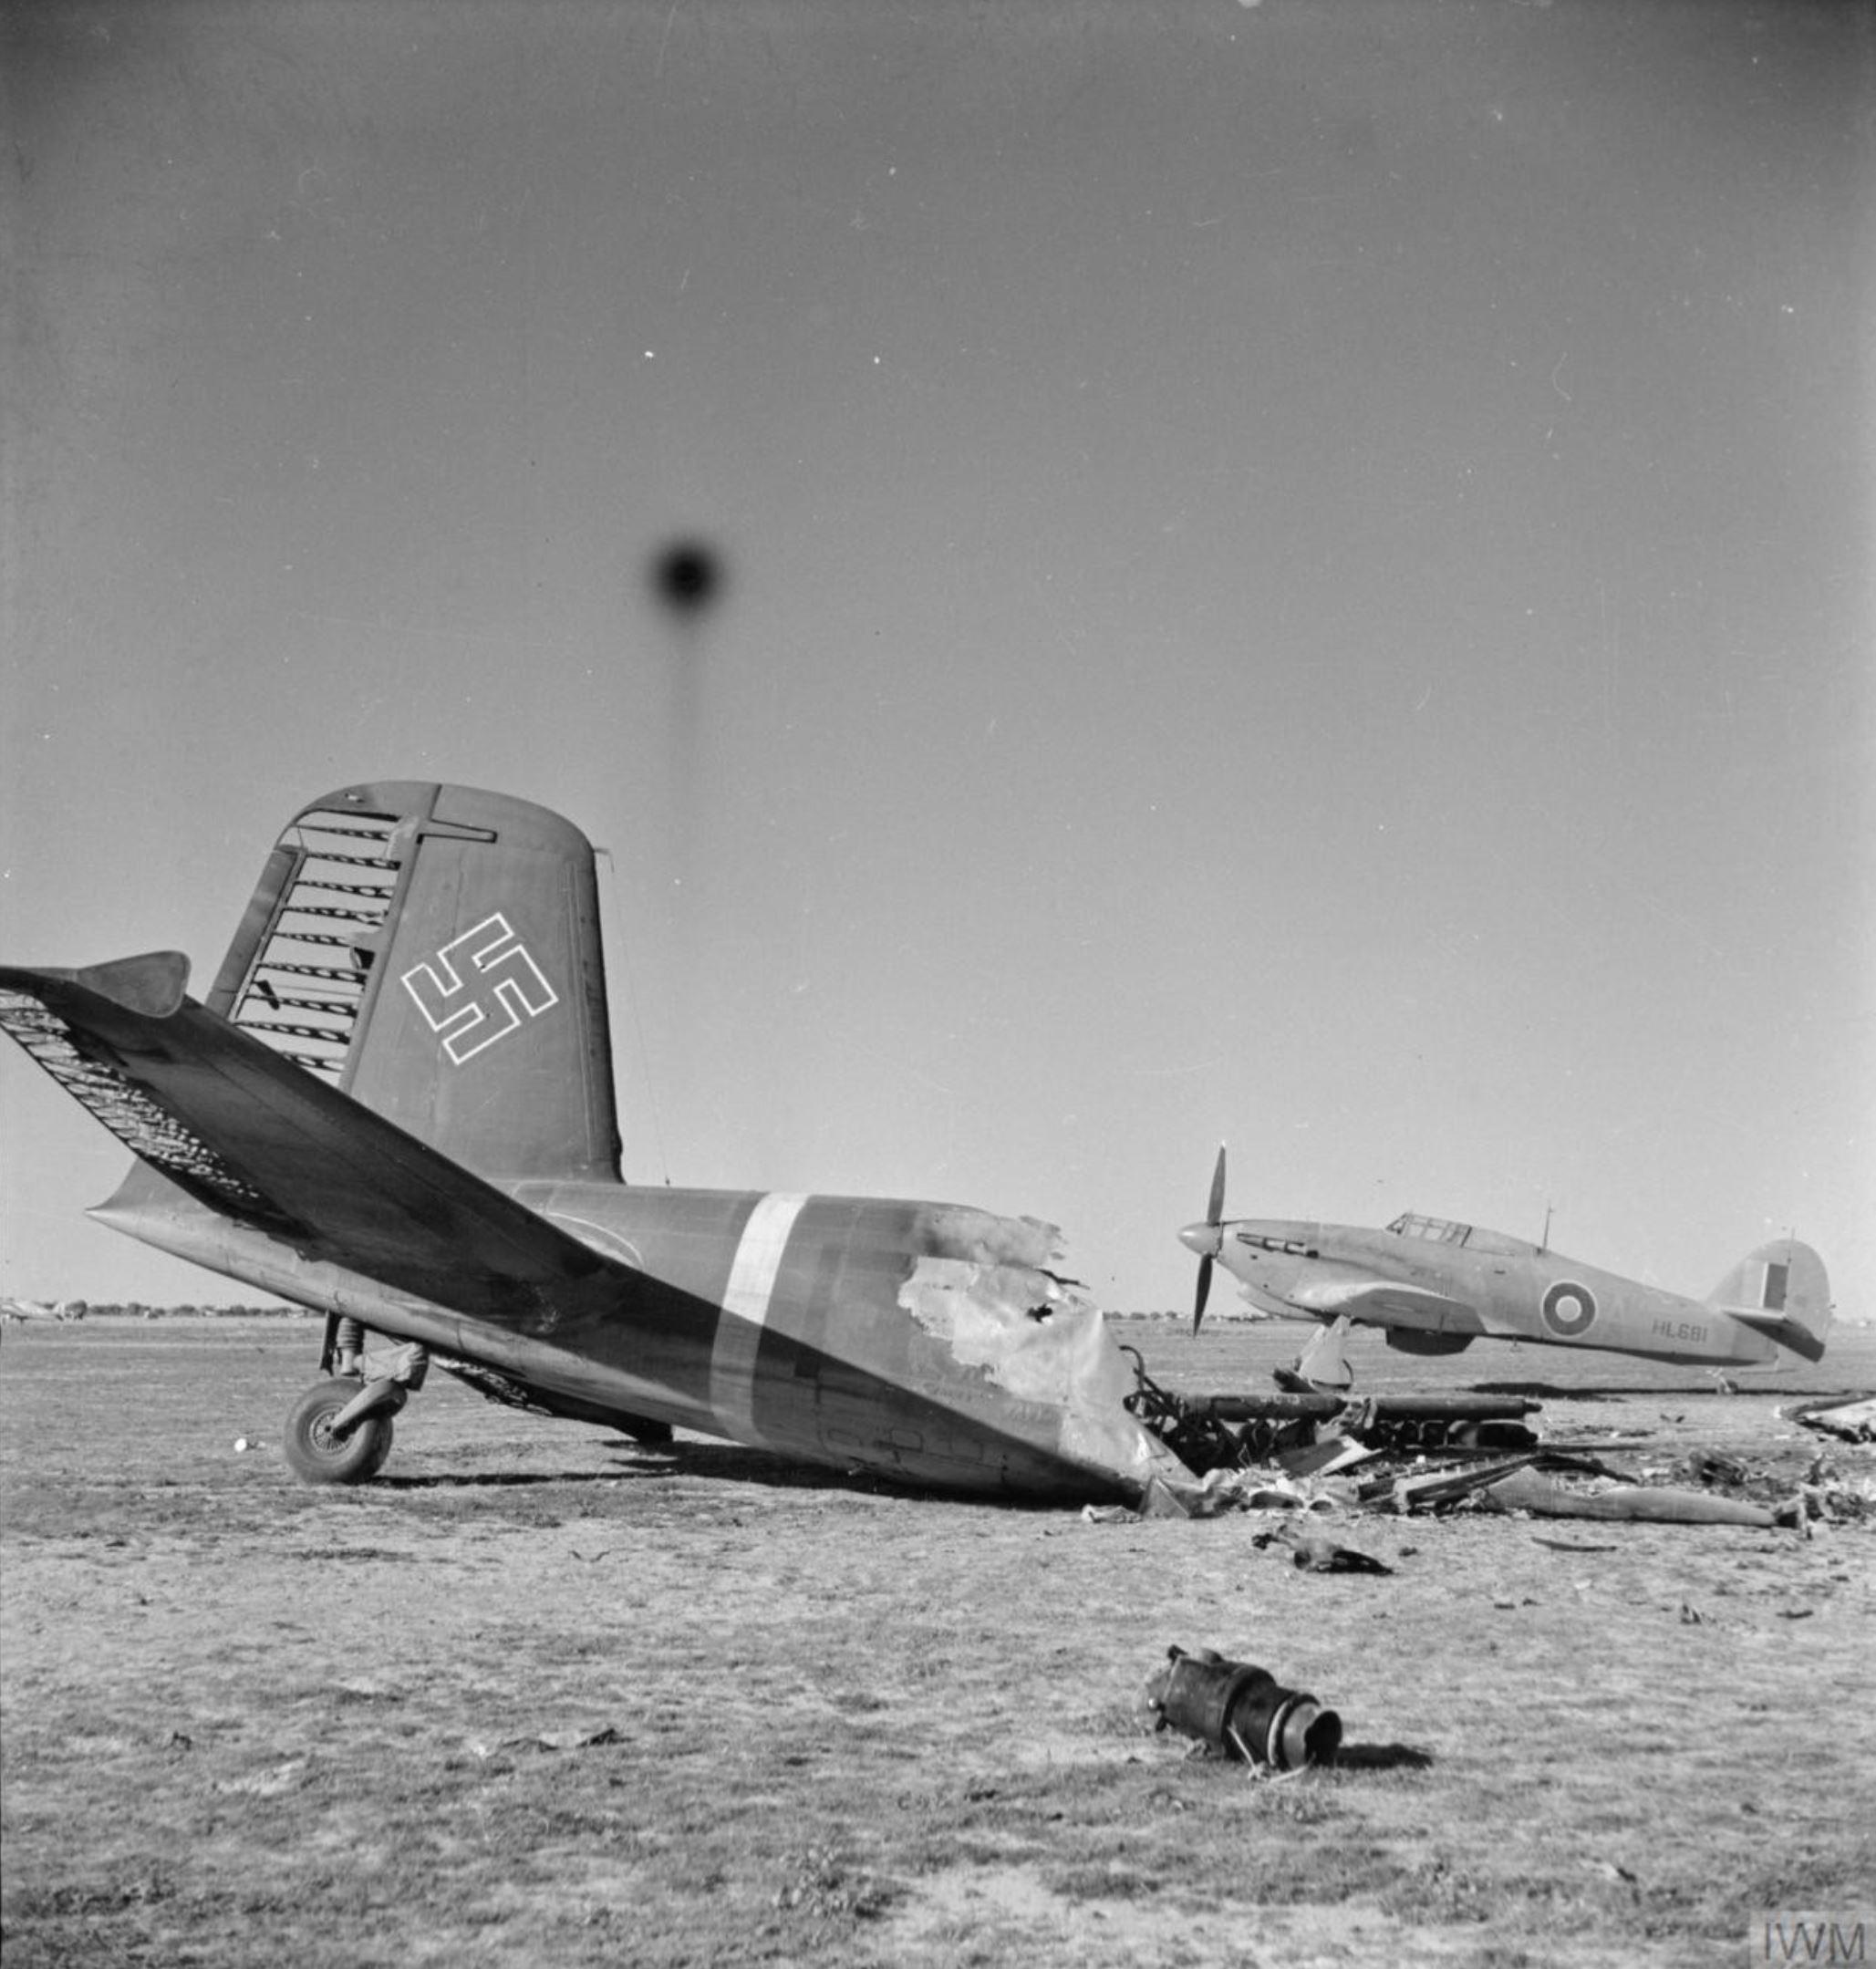 Hurricane IIb RAF 274Sqn A HL681 based at Castel Benito Tripolitania IWM CM4538